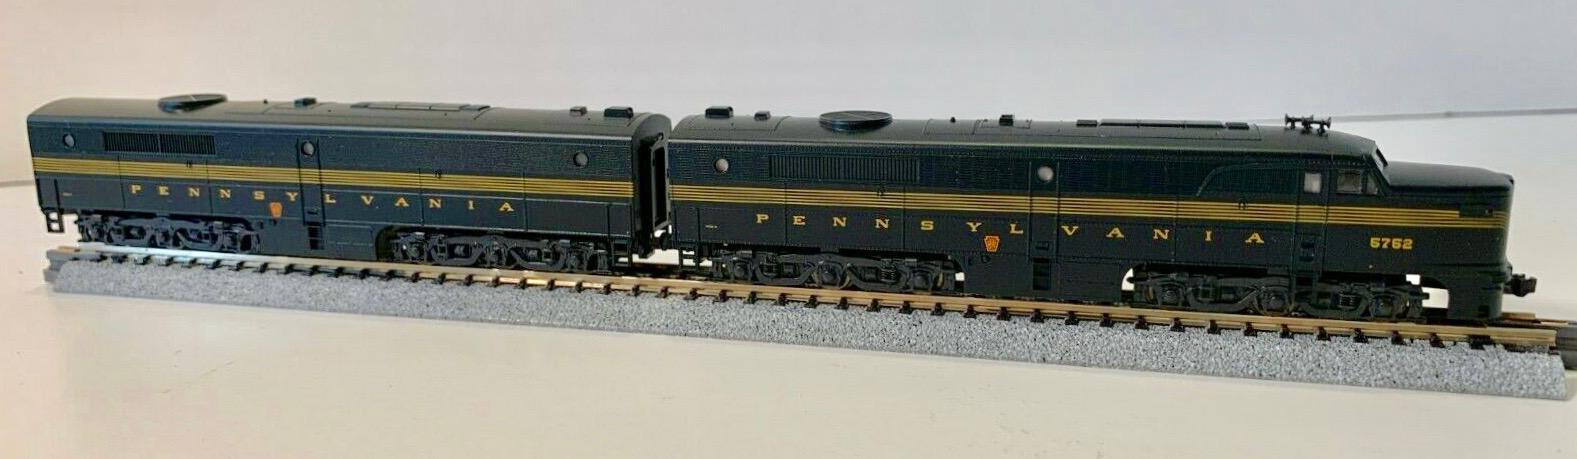 N Scale - Kato USA - 106-0703 - Locomotive, Diesel, Alco PA/PB - Pennsylvania - 5752, 5750B